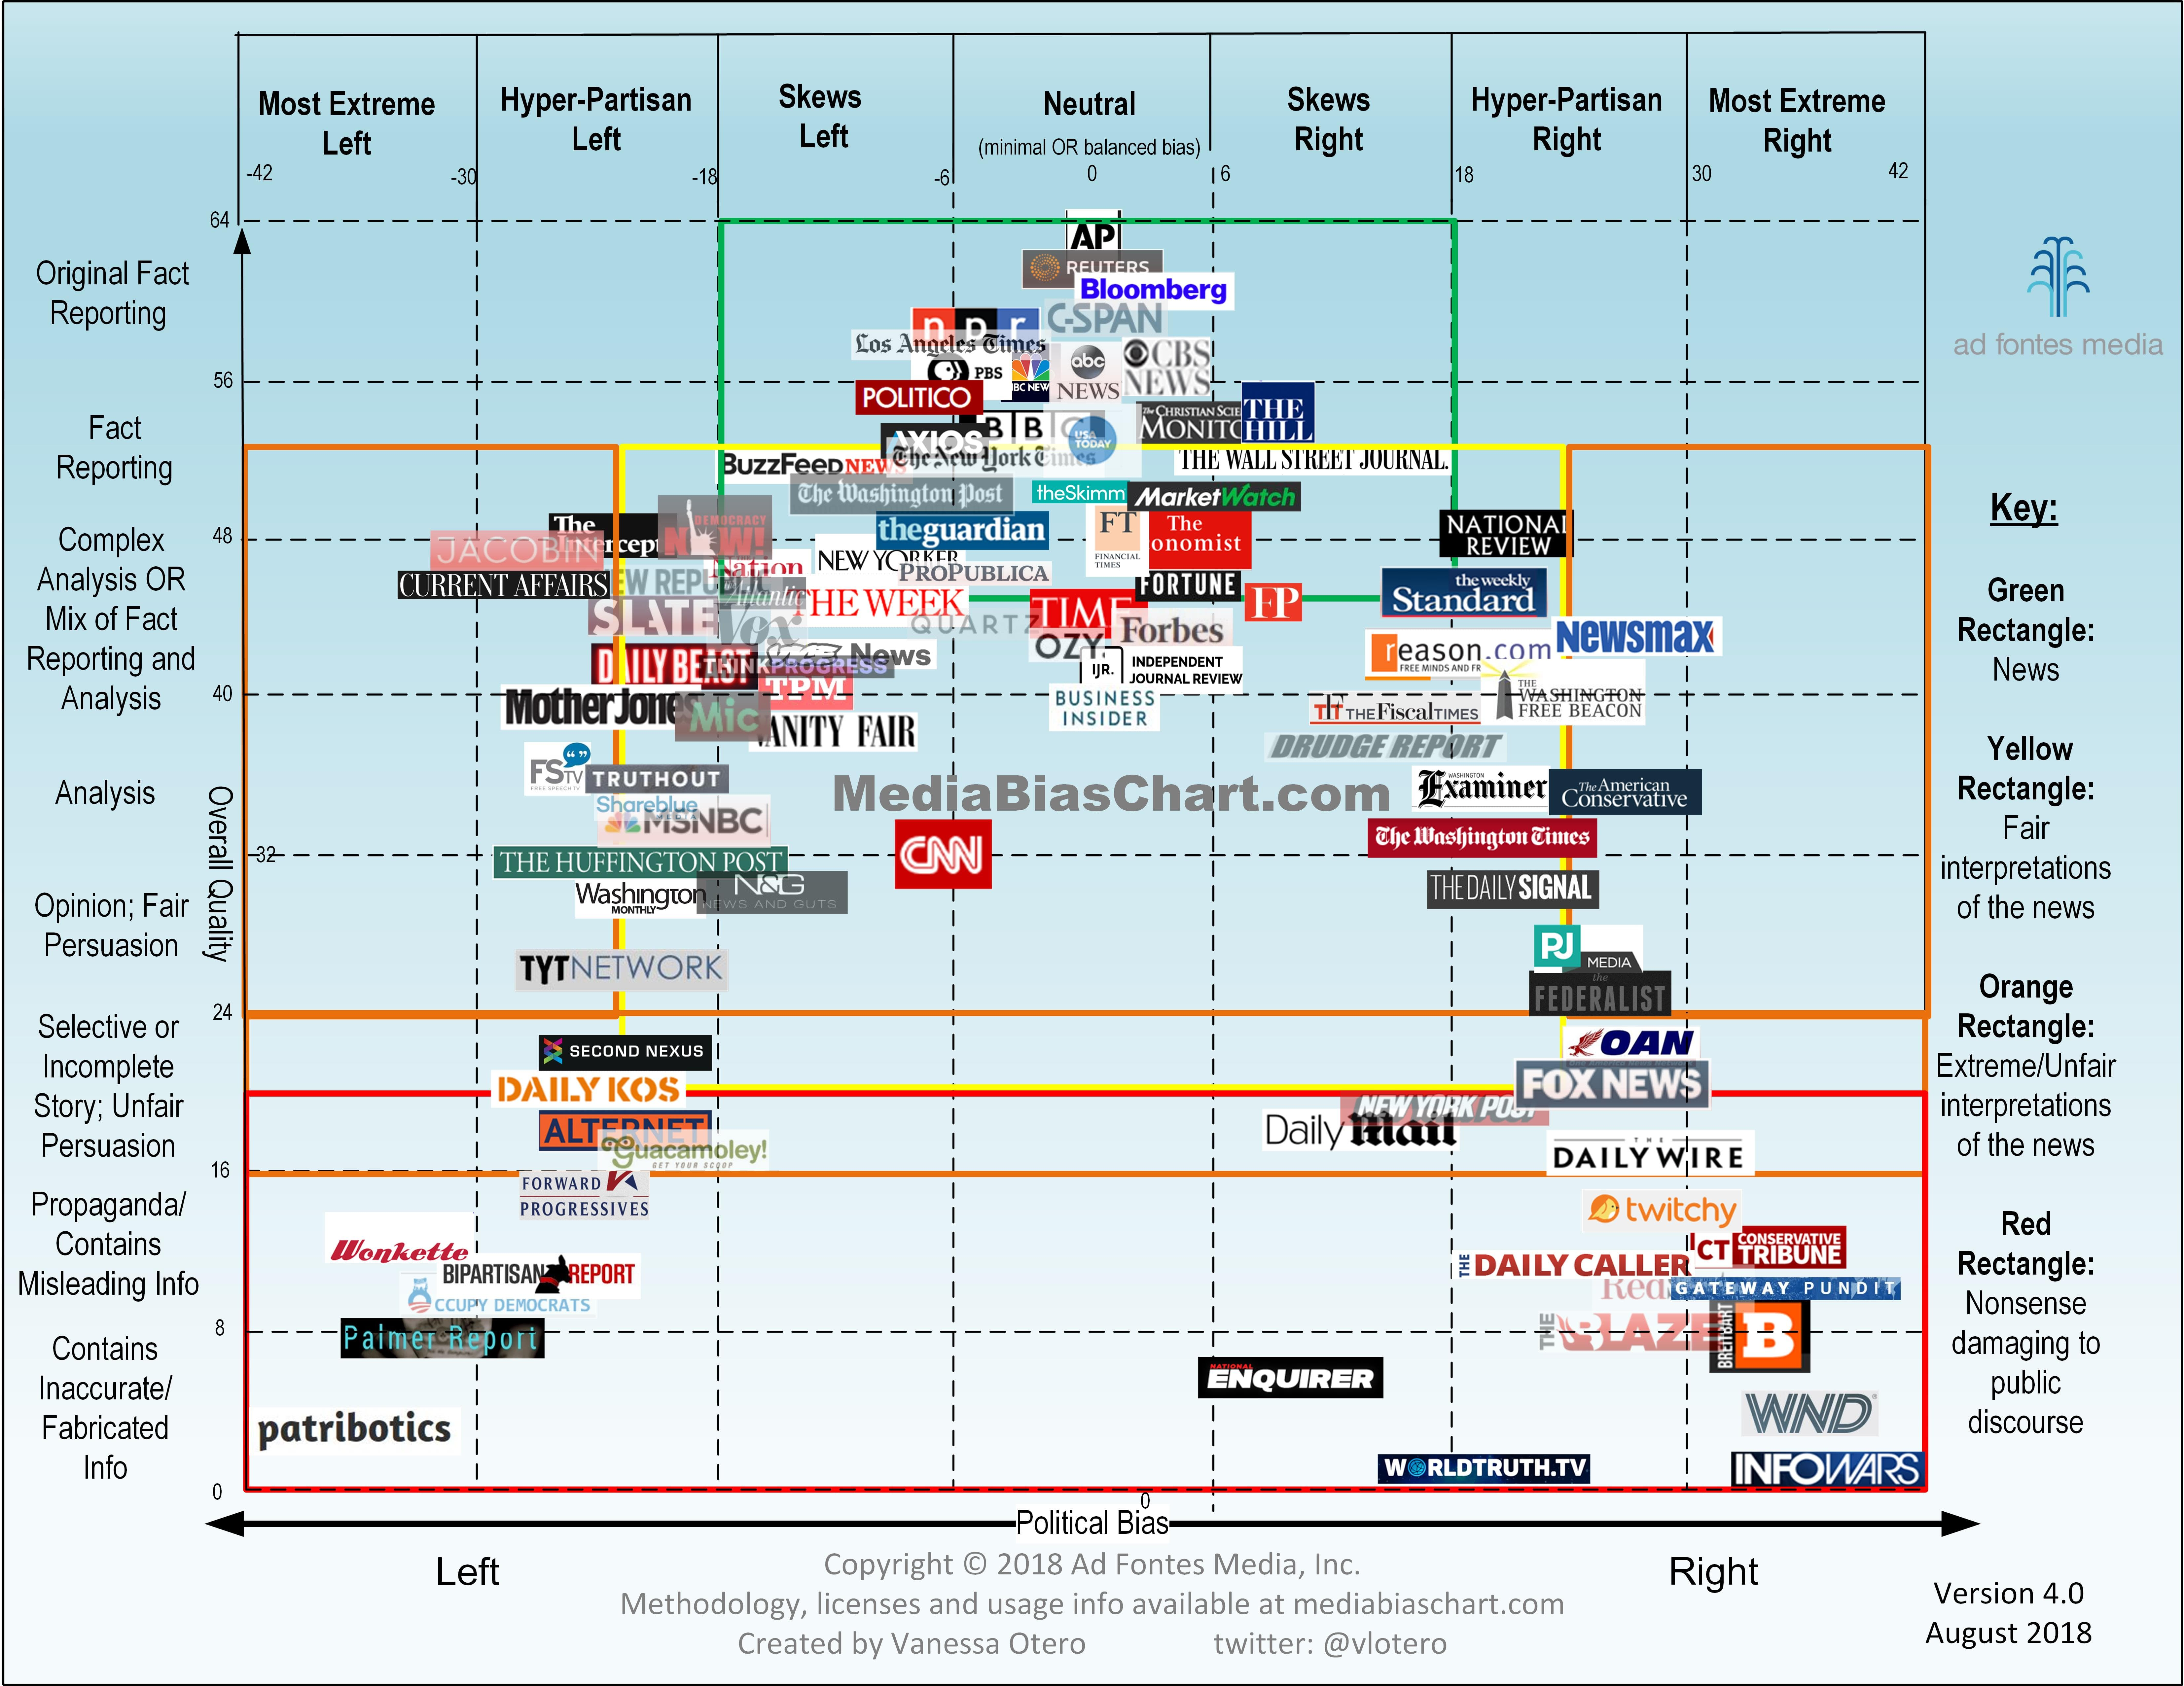 Media Bias Chart 4.0